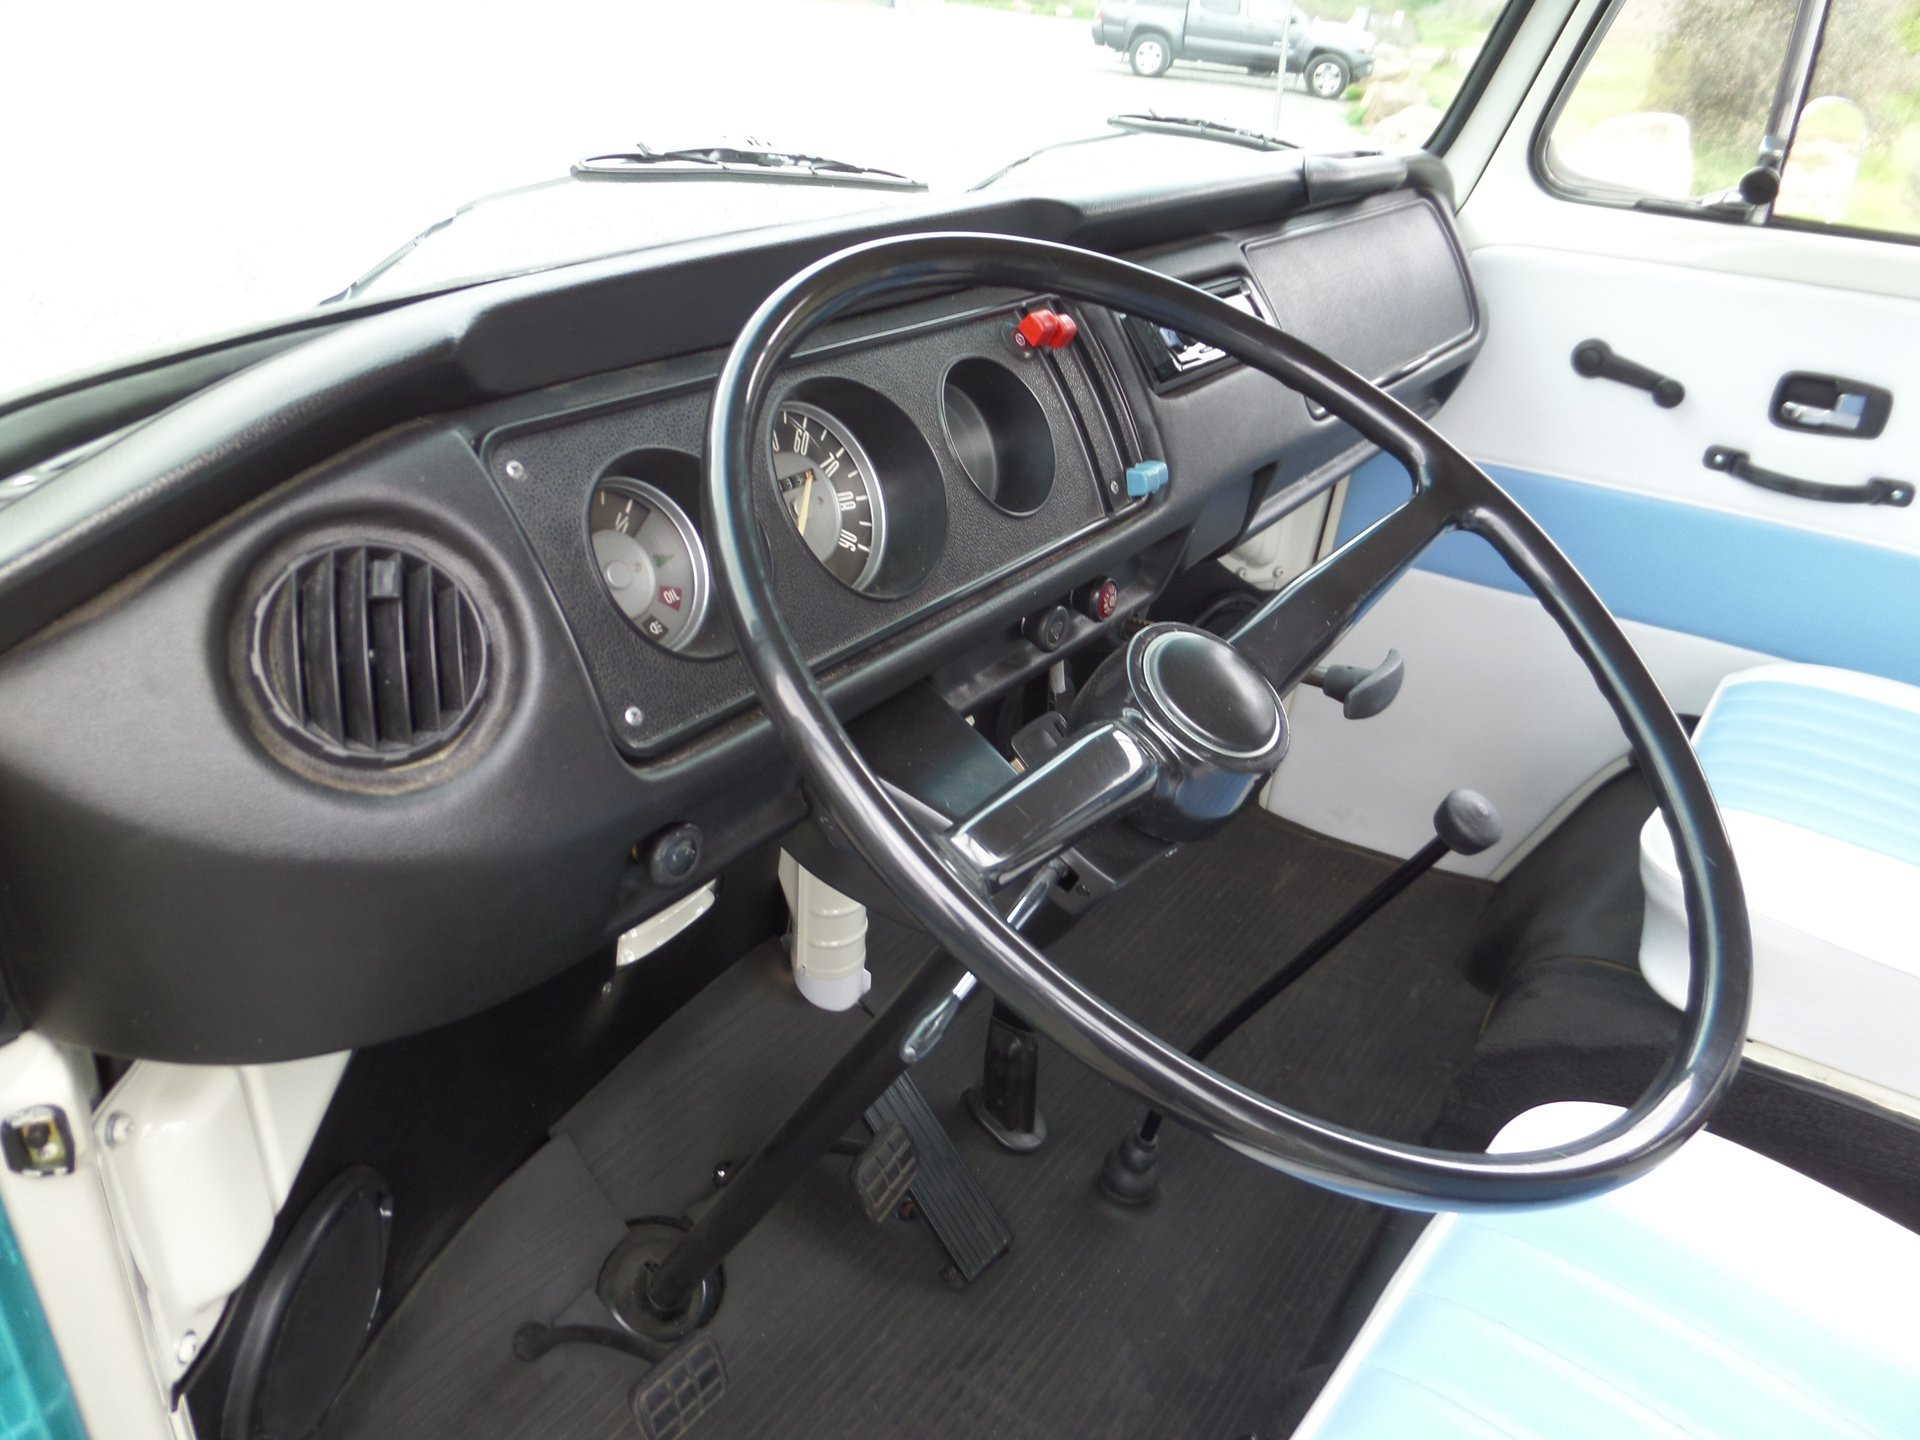 1970 Volkswagen Type 2 | Laguna Classic Cars & Automotive Art